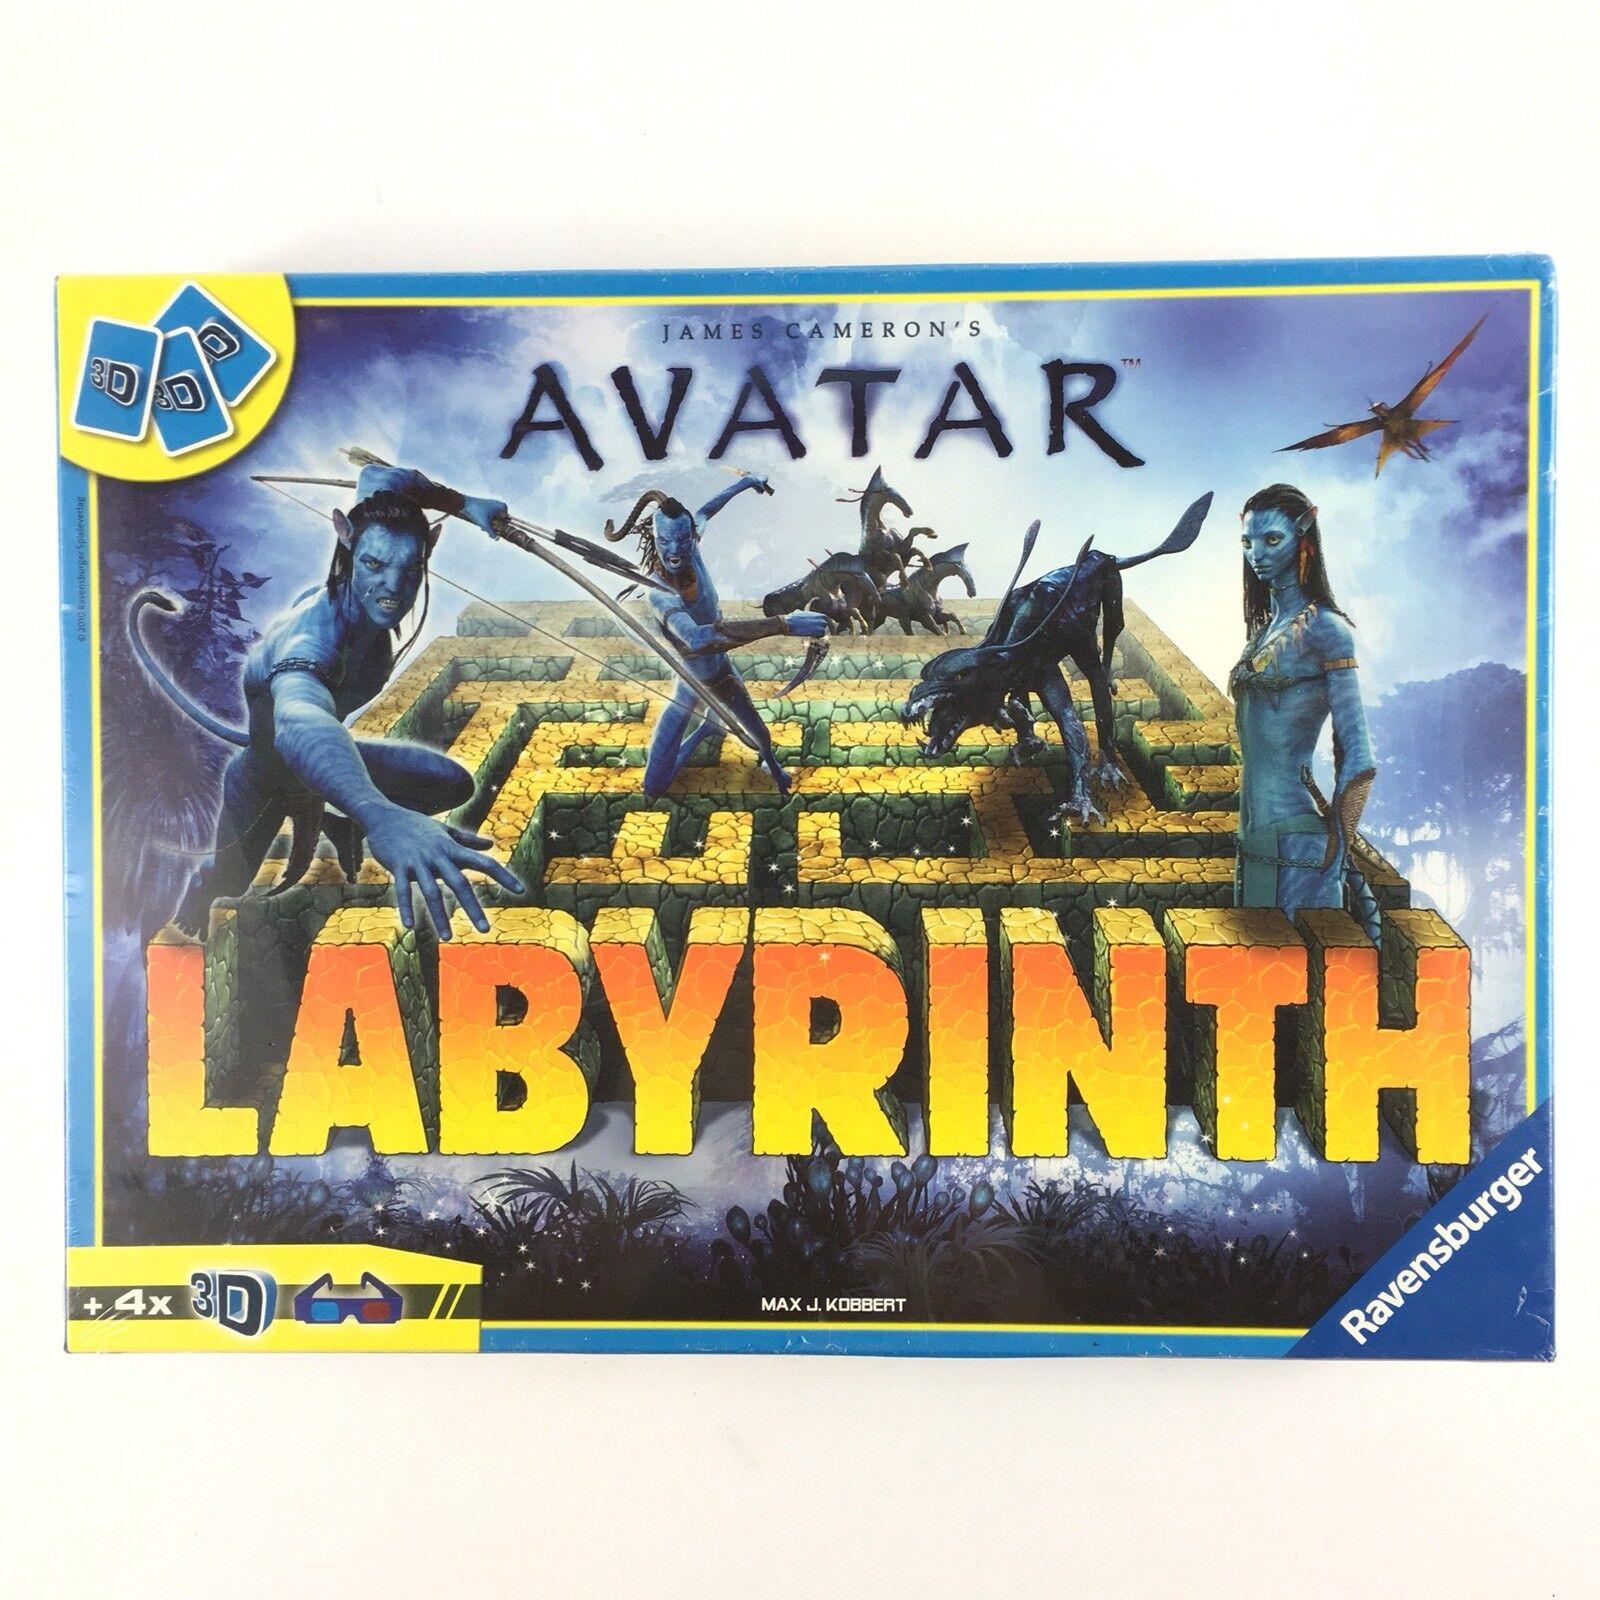 Avatar Labyrinth 3D Board Game Ravensburger New Sealed